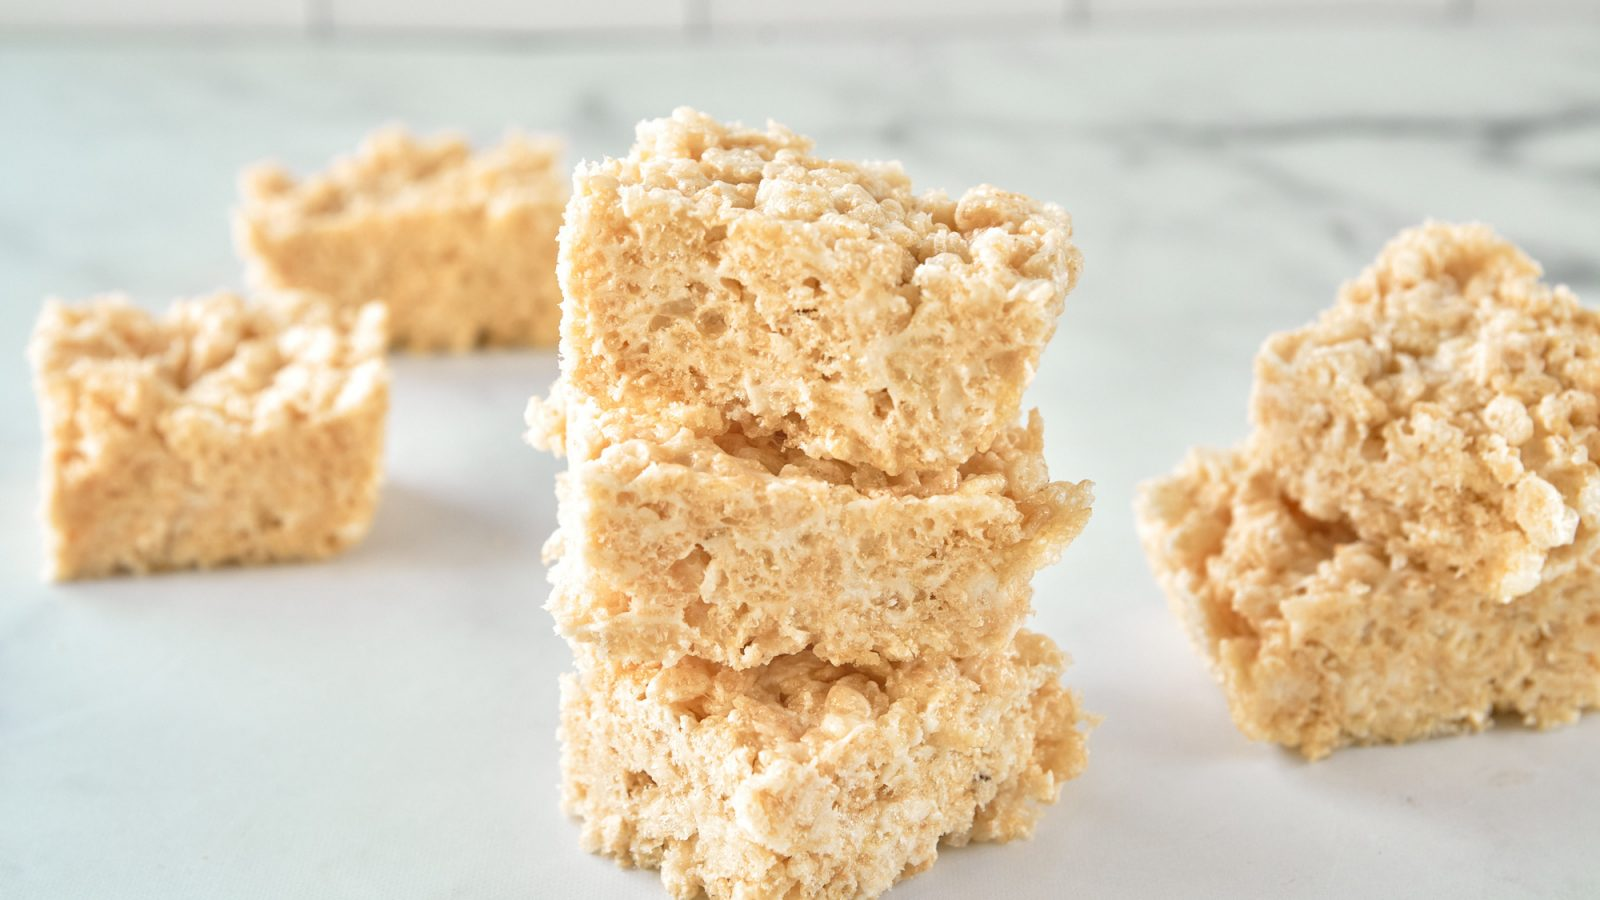 vegan rice krispie treats stacked on the counter